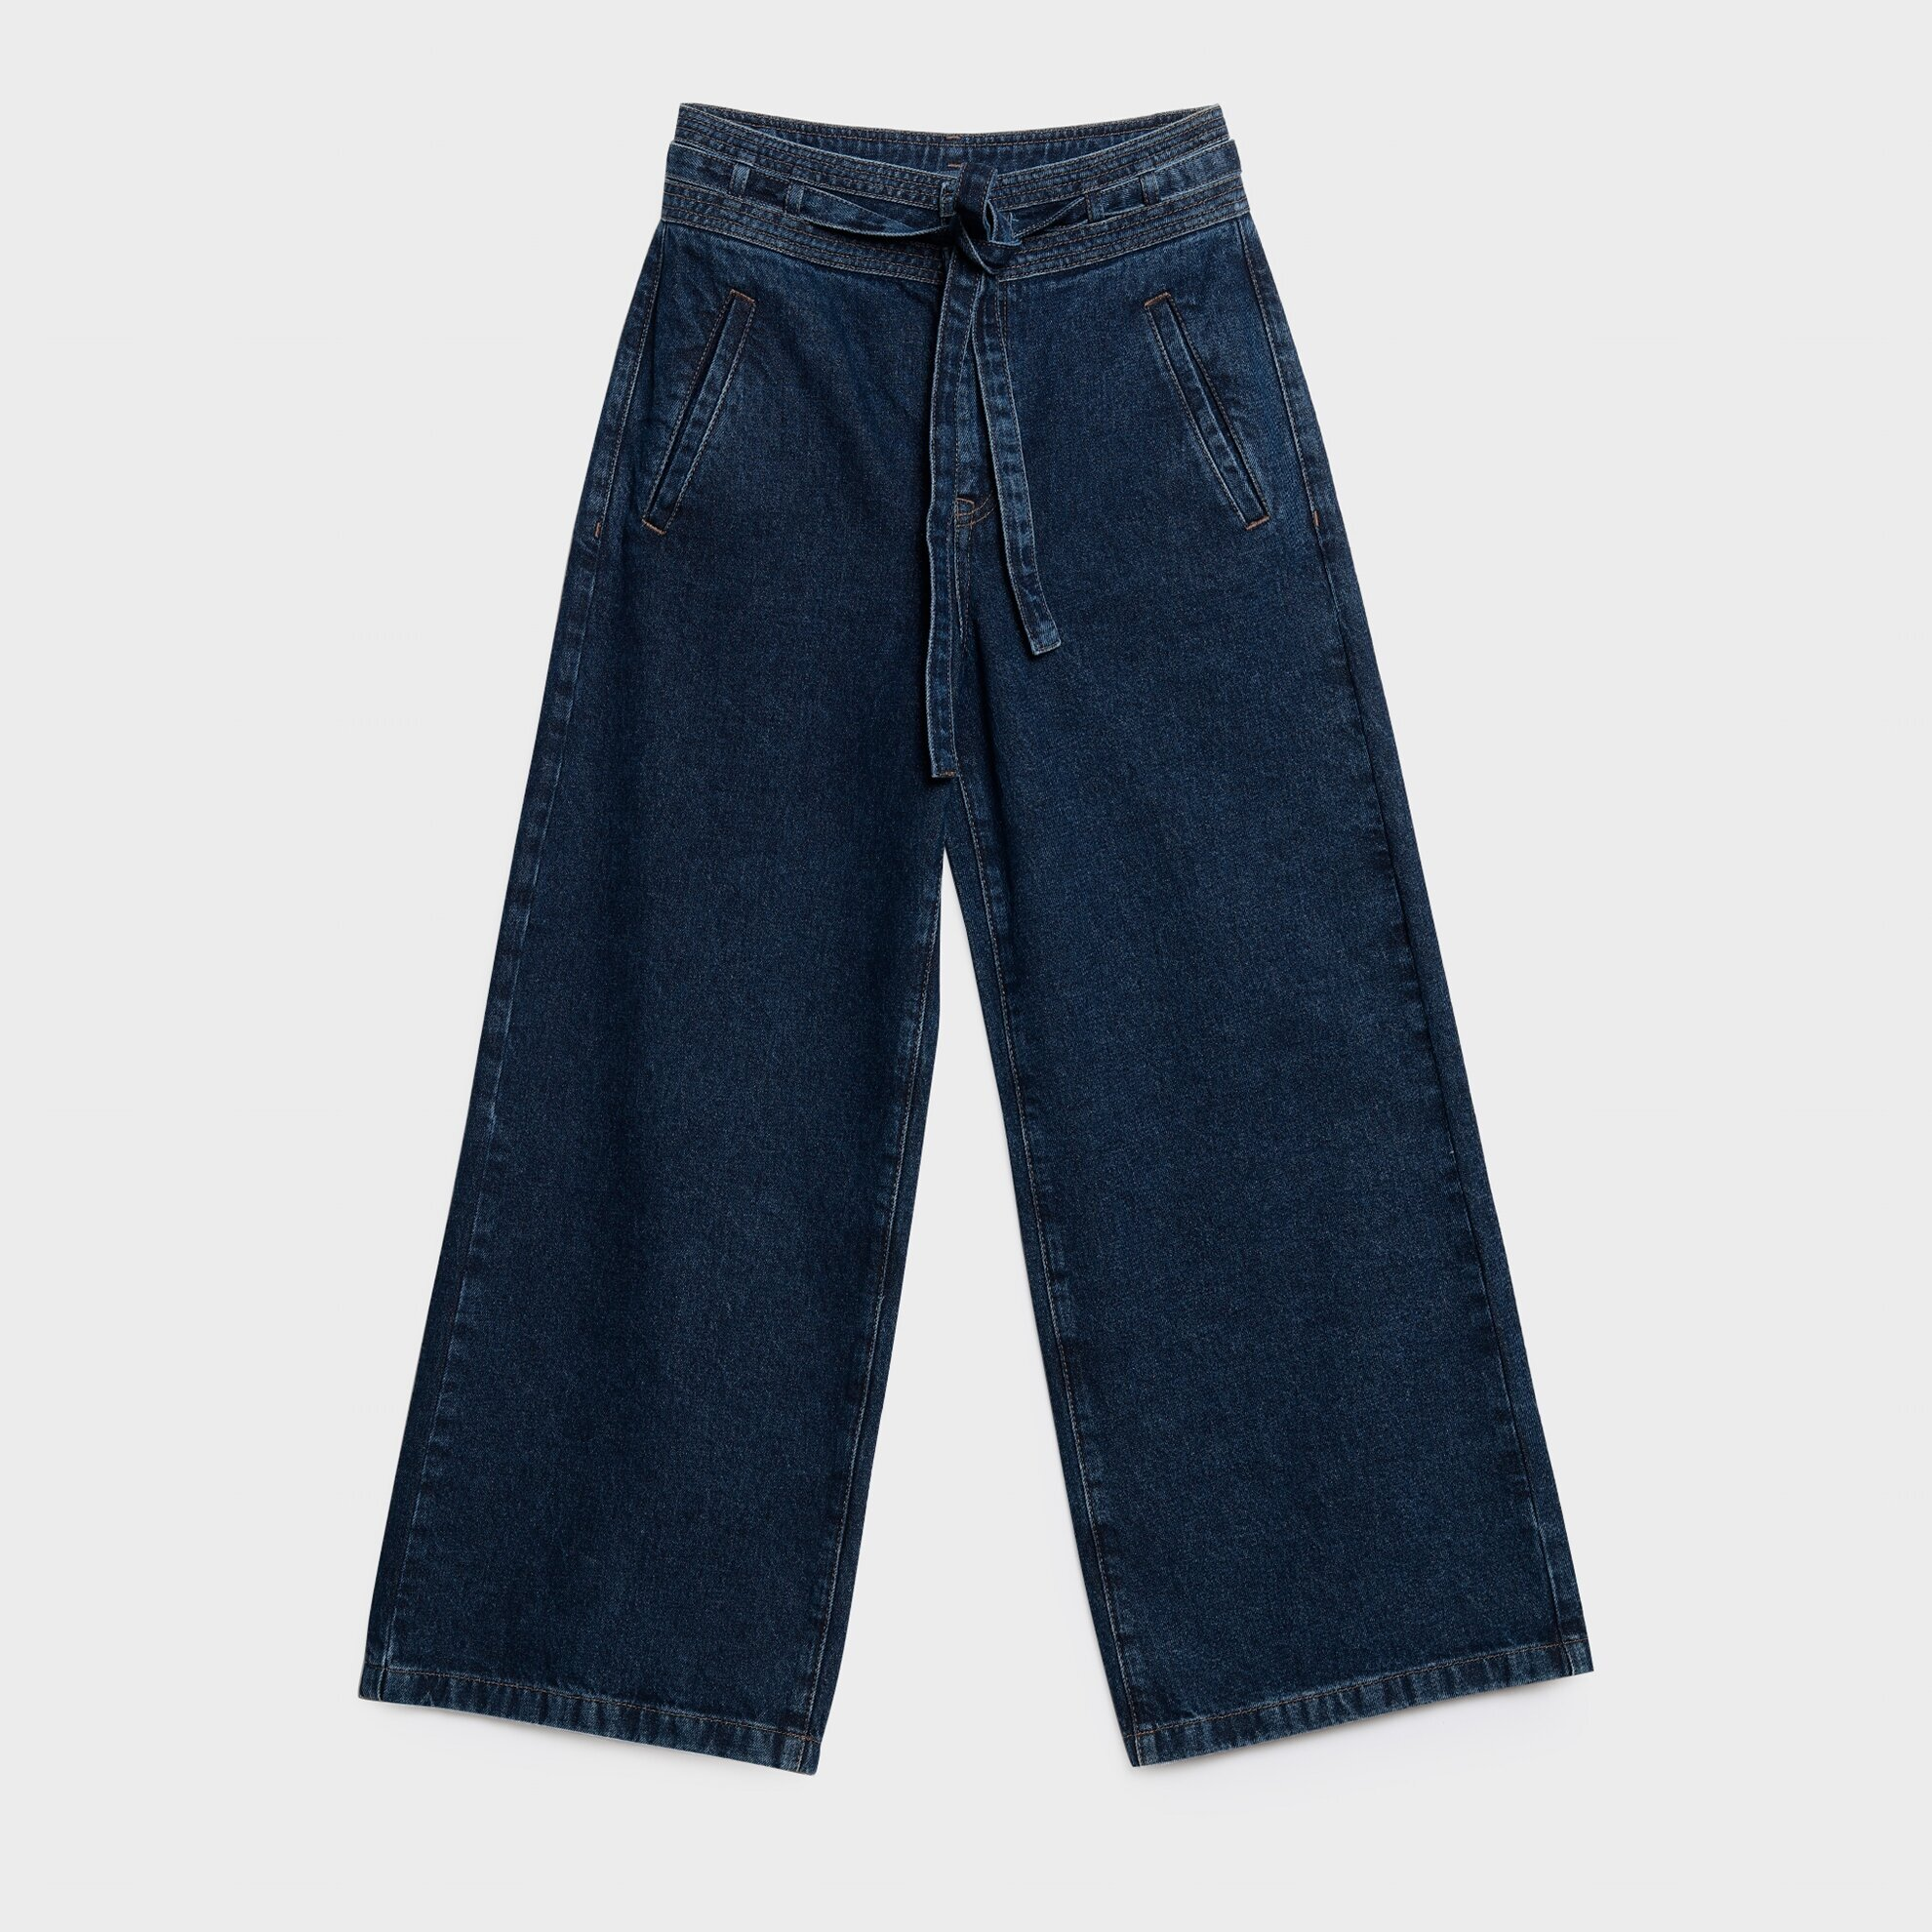 Kemer Detaylı Denim Pantolon